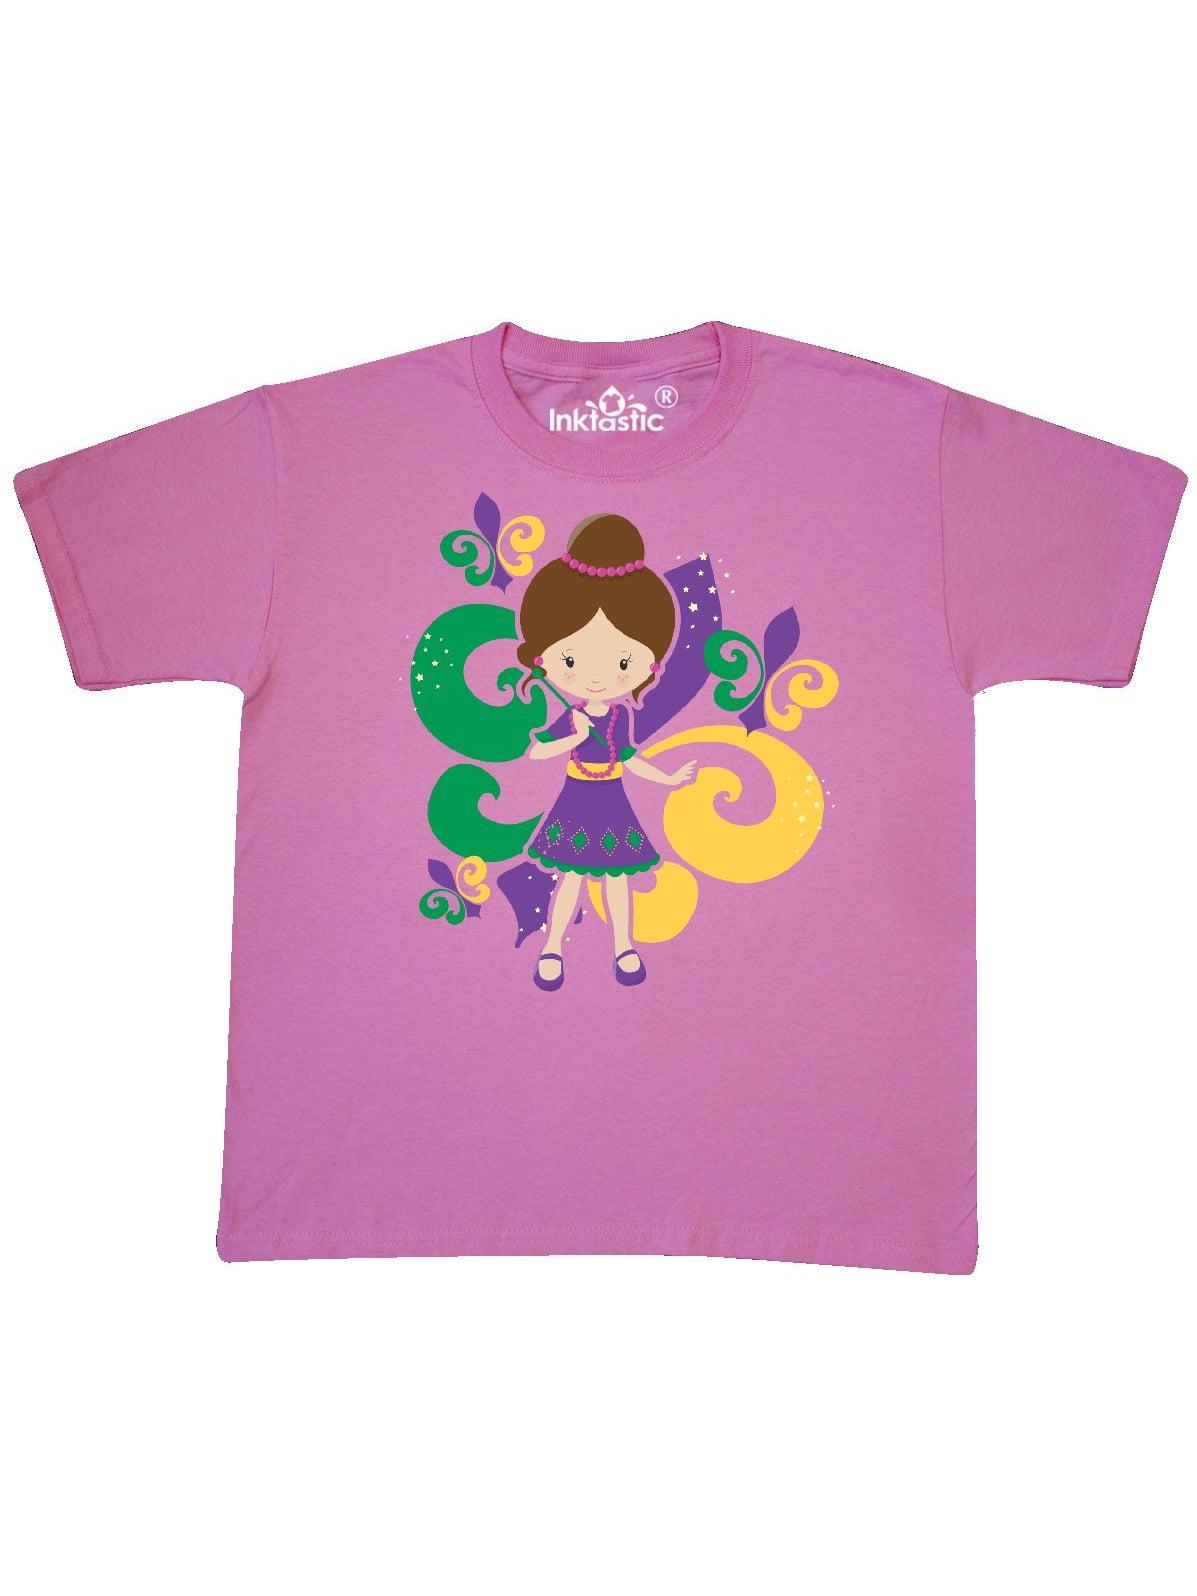 Mardi Gras Girl Youth T-Shirt